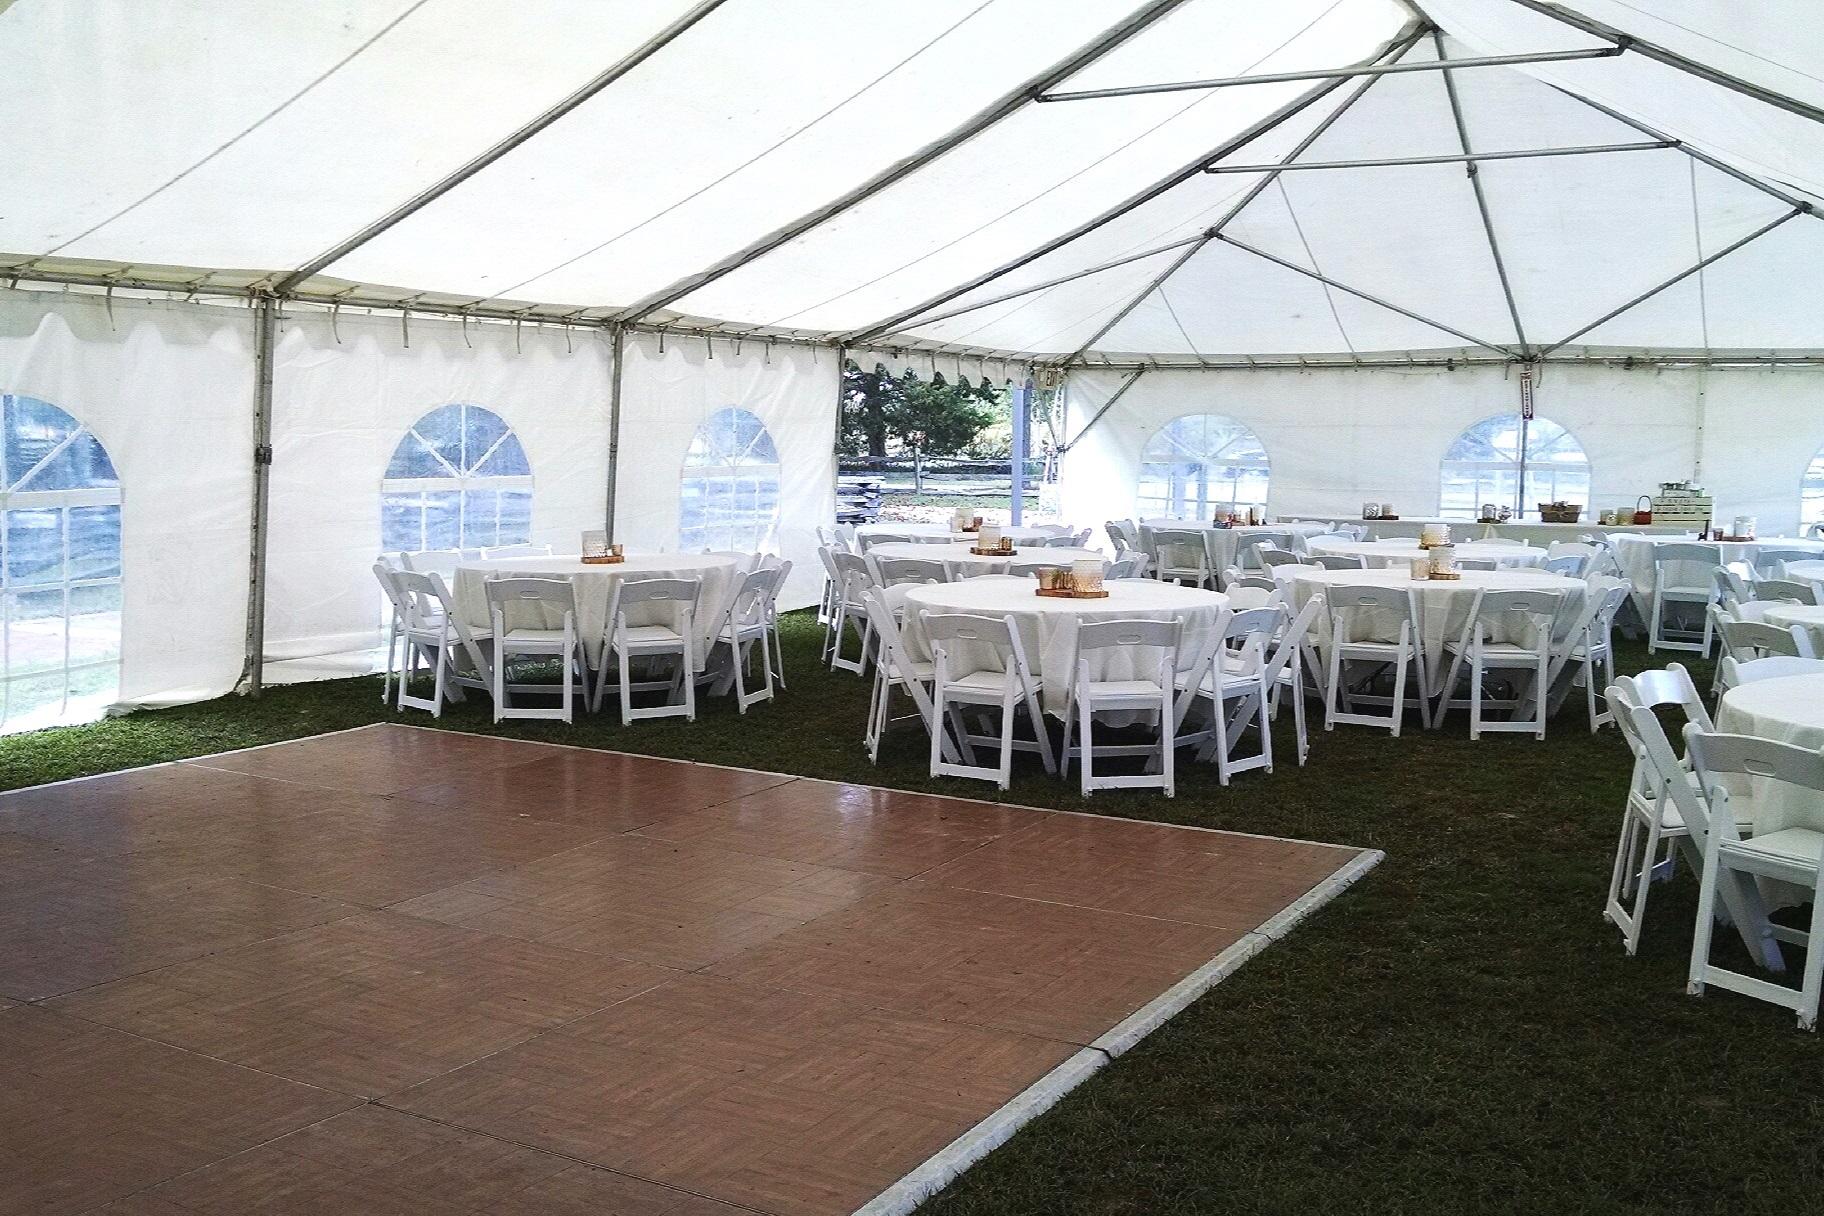 30 X 60 Frame Tent - Historic Polegreen